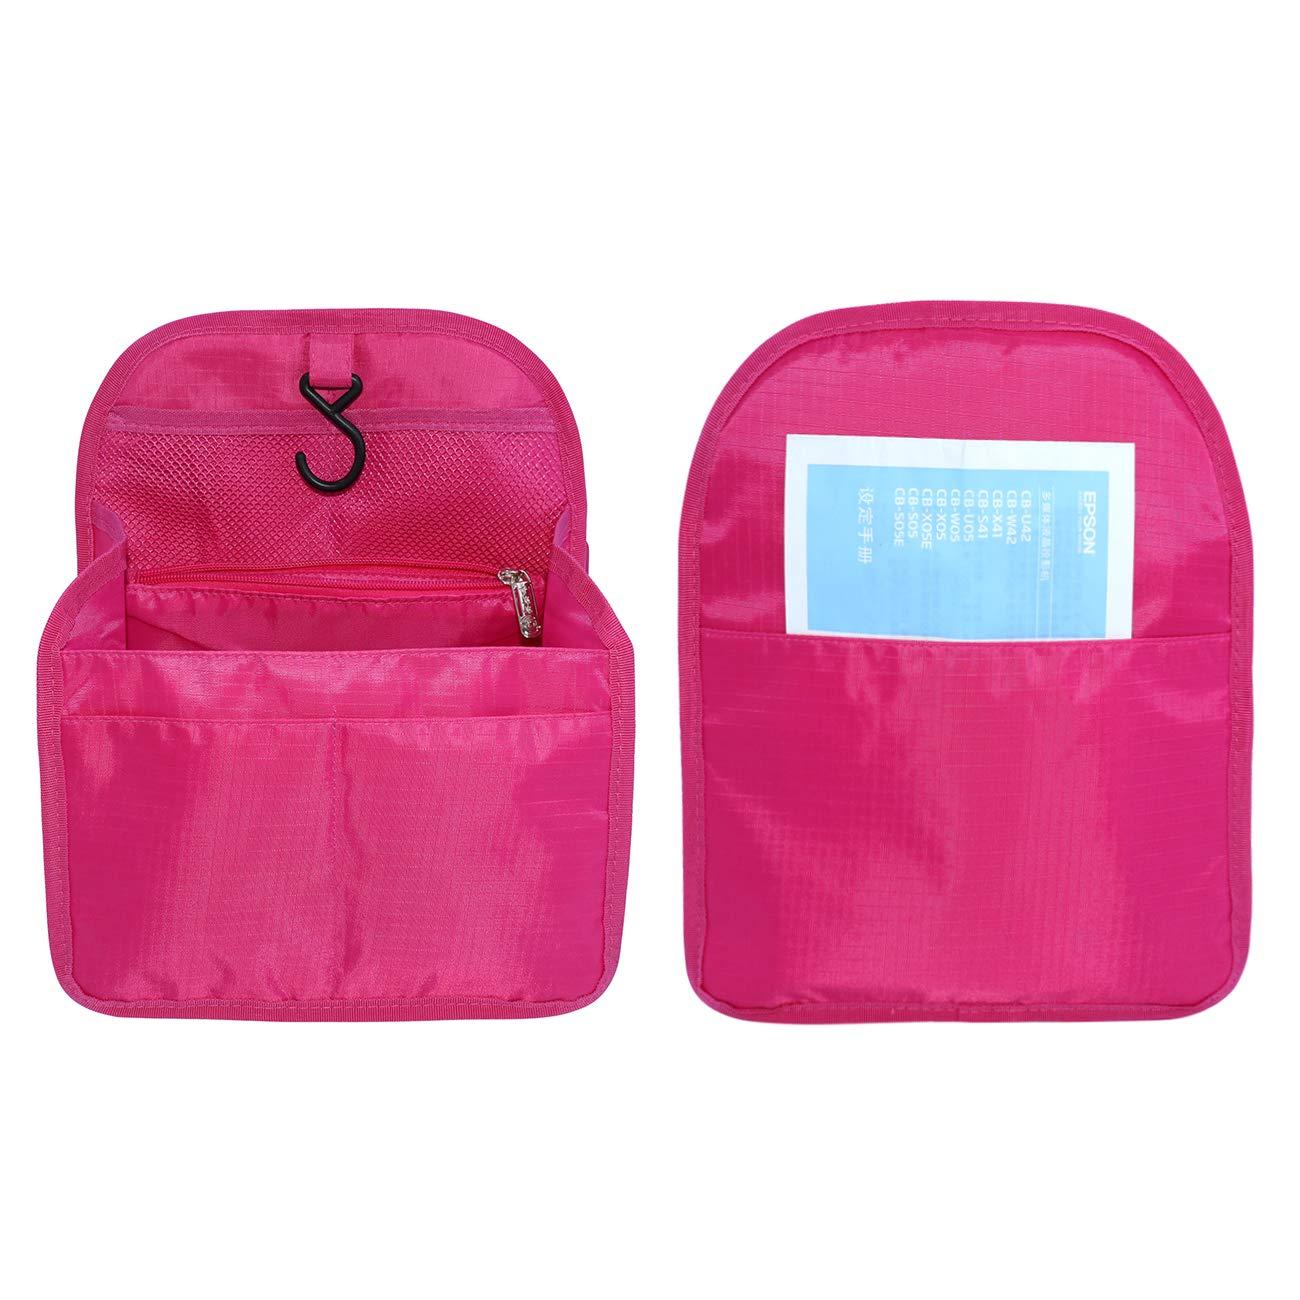 APSOONSELL Nylon Hanging Backpack Organiser Insert,Bag in Bag Shoulder Rucksack Bags Handbag Organizers for Women and Girls Black M